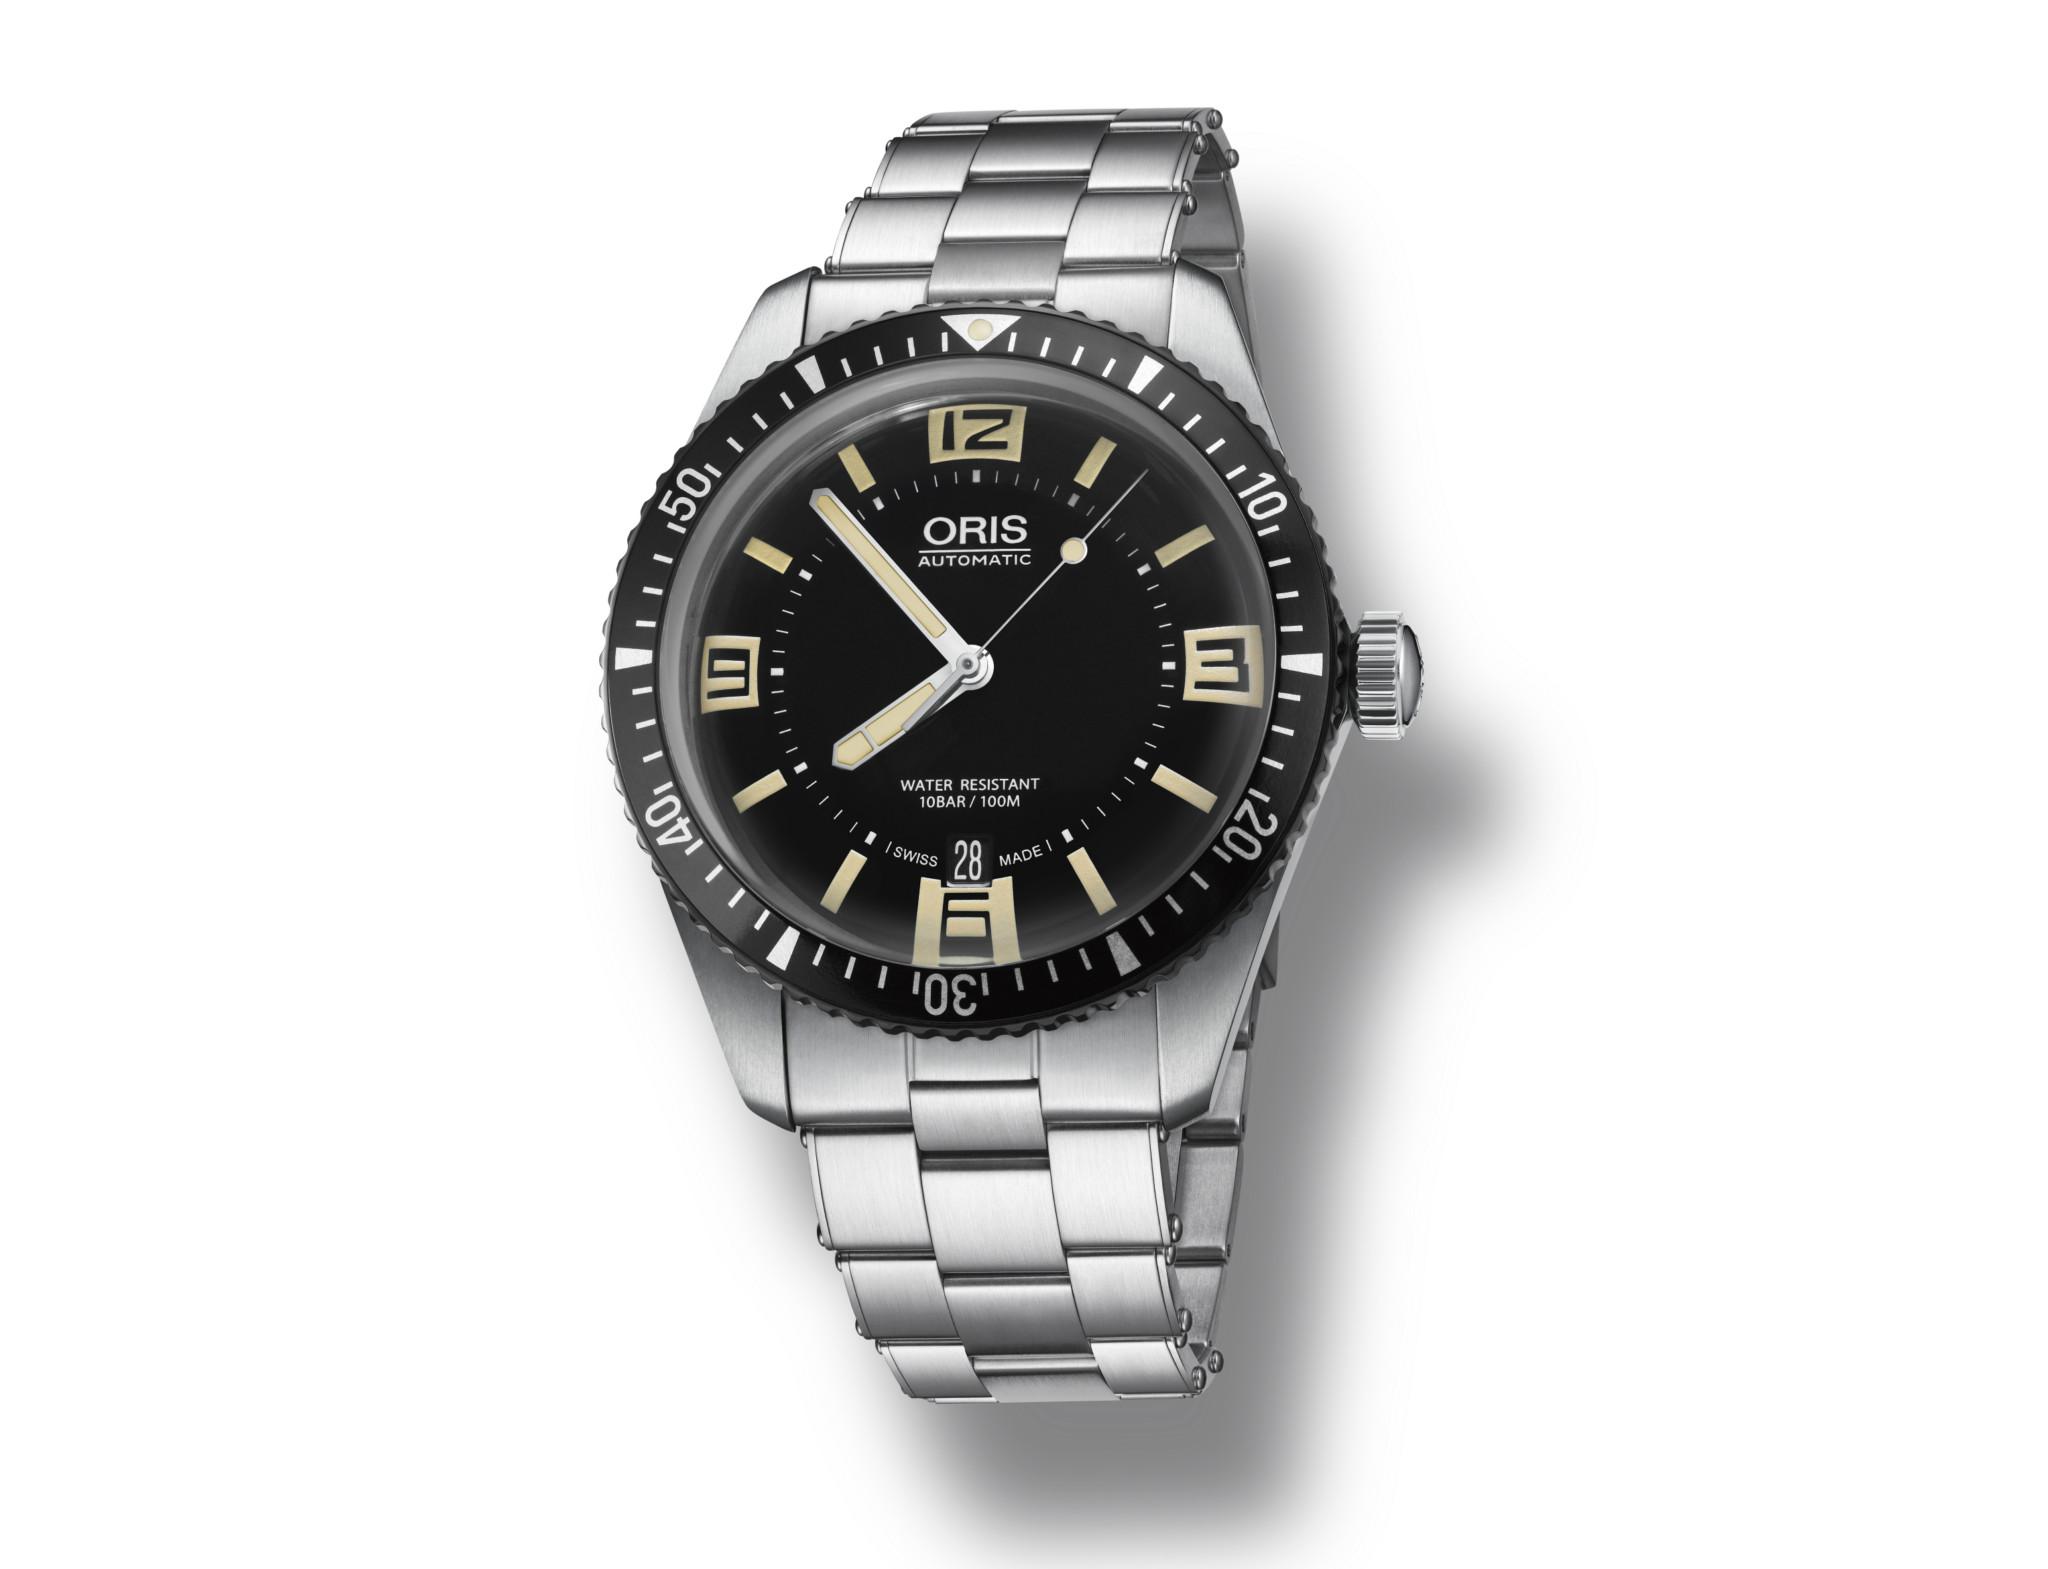 01 733 7707 4064-07 8 20 18 – Oris Divers Sixty-Five